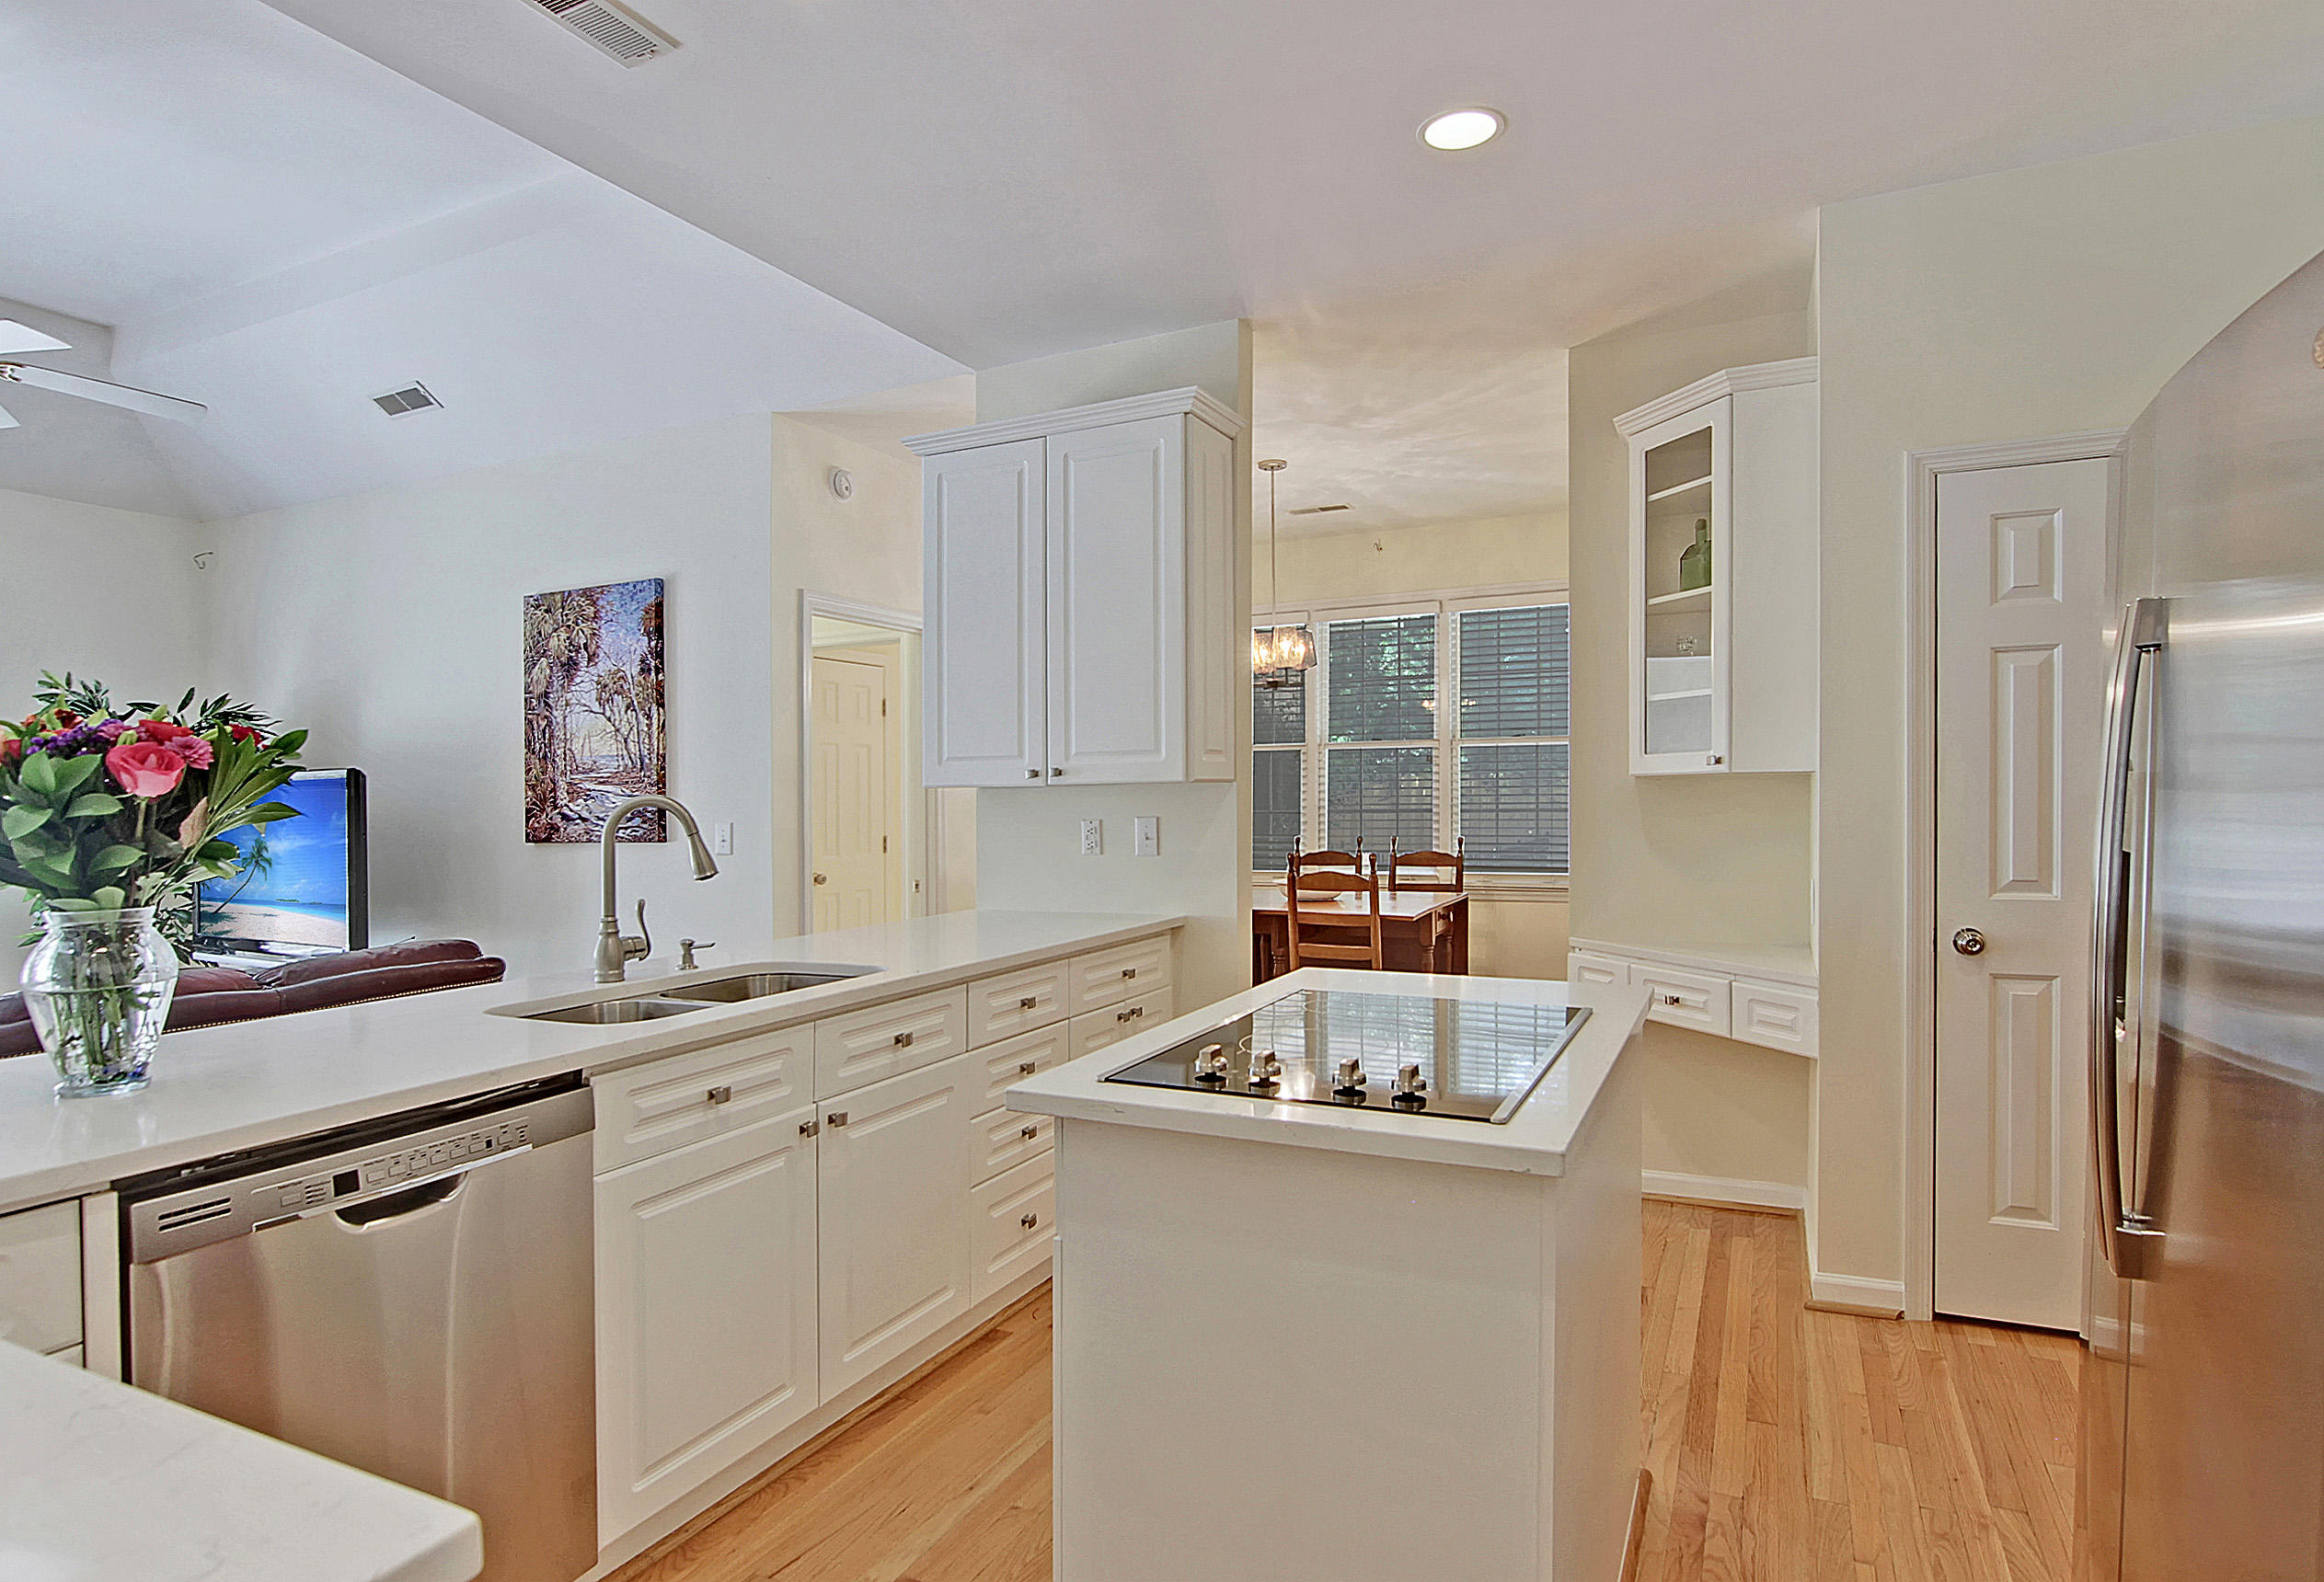 Snee Farm Homes For Sale - 1157 Shilling, Mount Pleasant, SC - 29